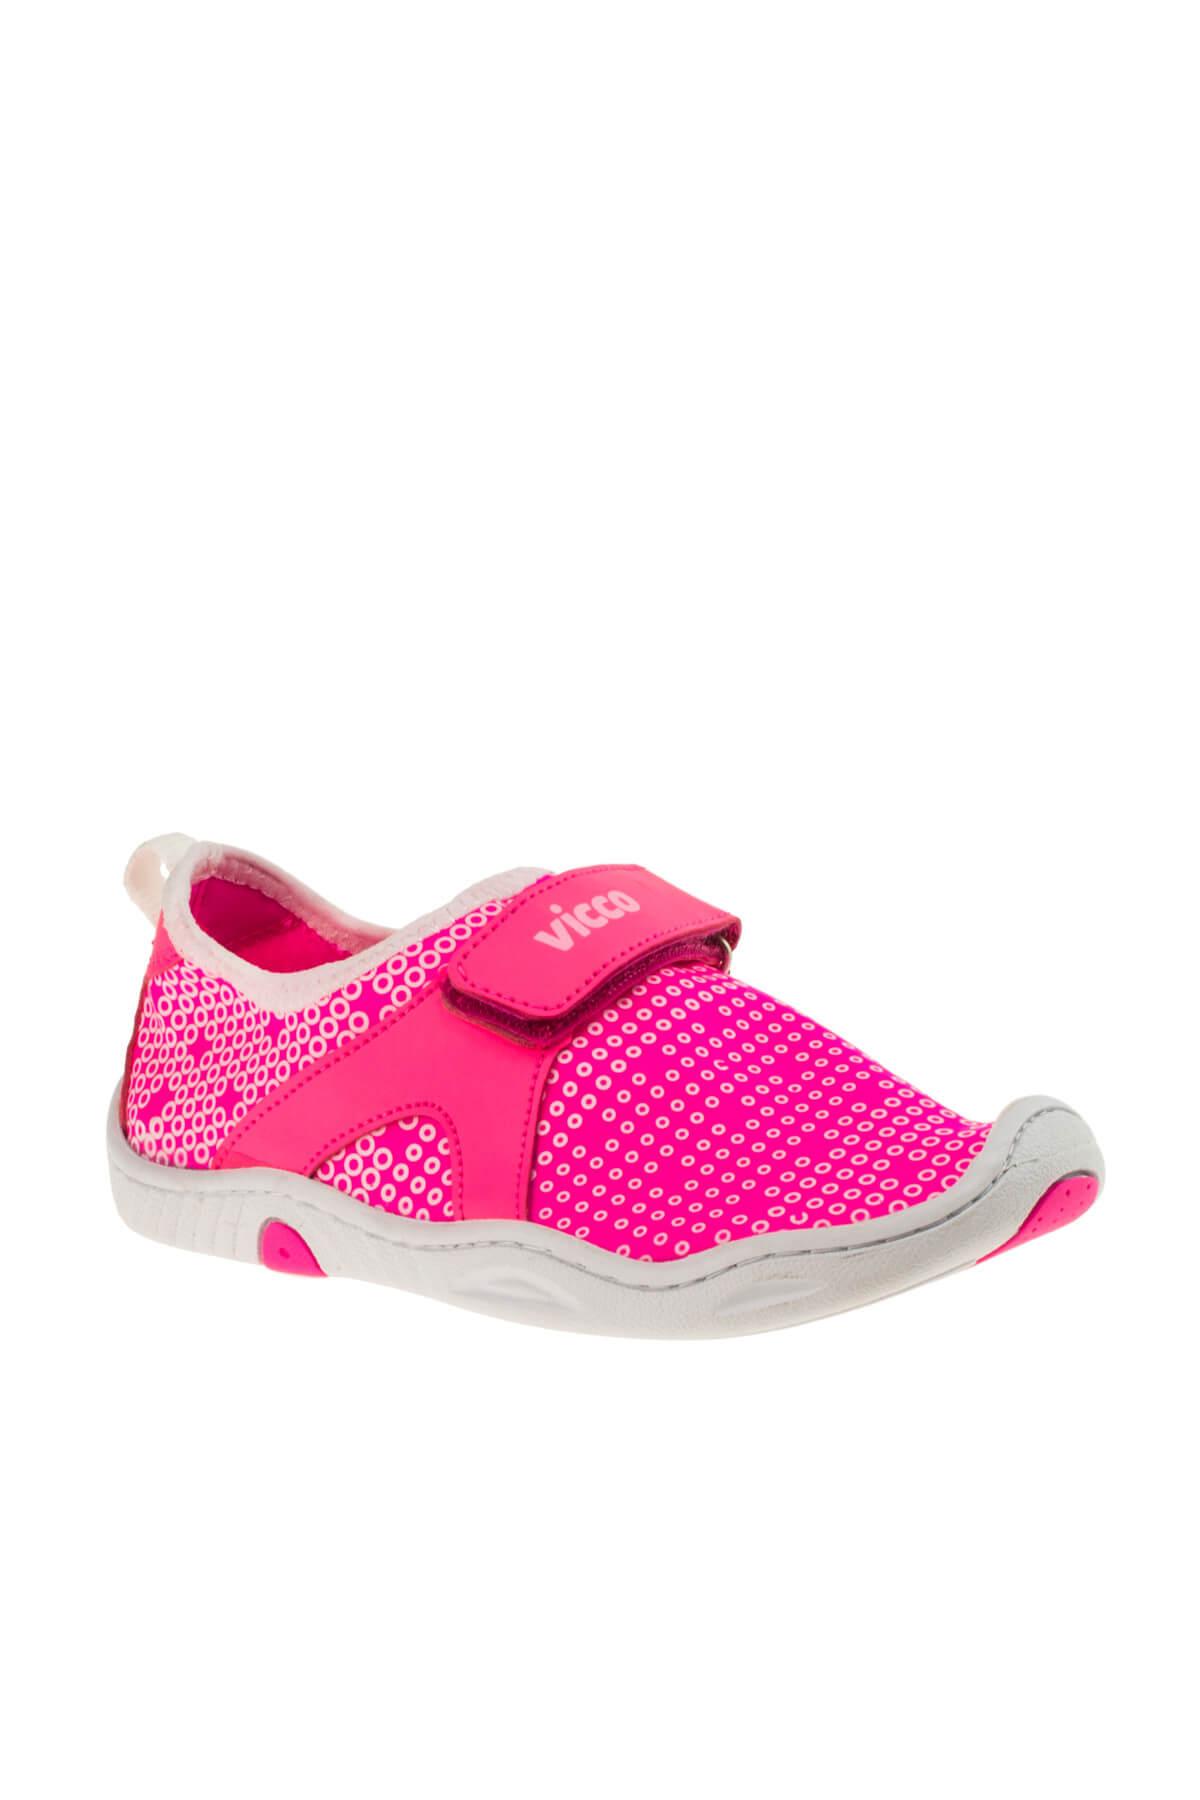 Vicco Pembe Çocuk Ayakkabı 211 224.18Y657F 1